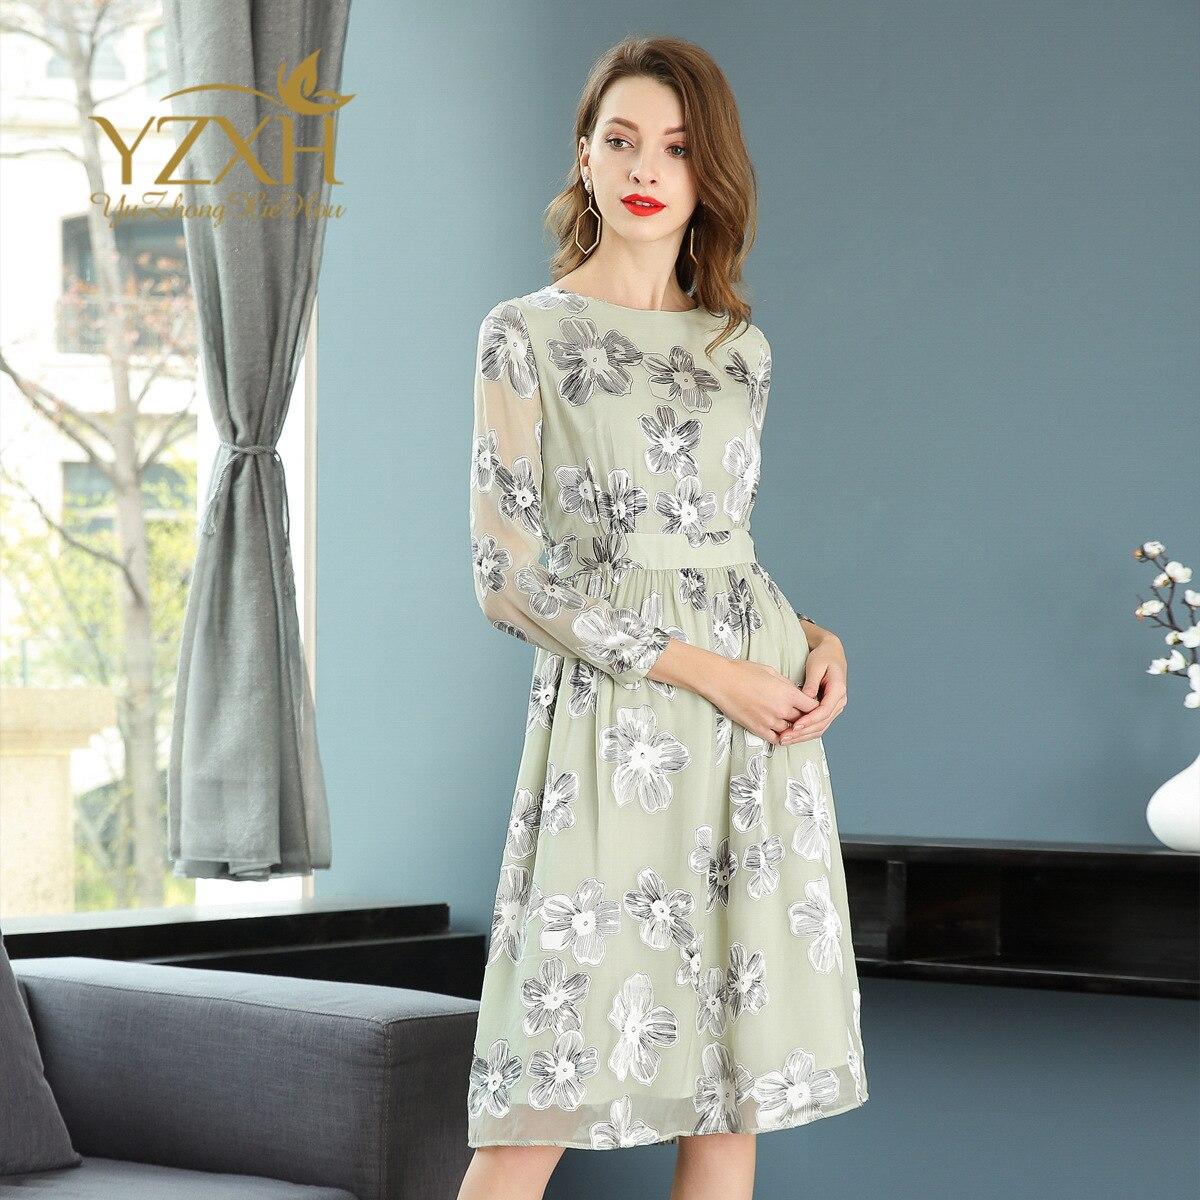 Здесь продается  Top quality print floral dress new 2018 spring summer dress high end women brand runway A line swing dress  Одежда и аксессуары